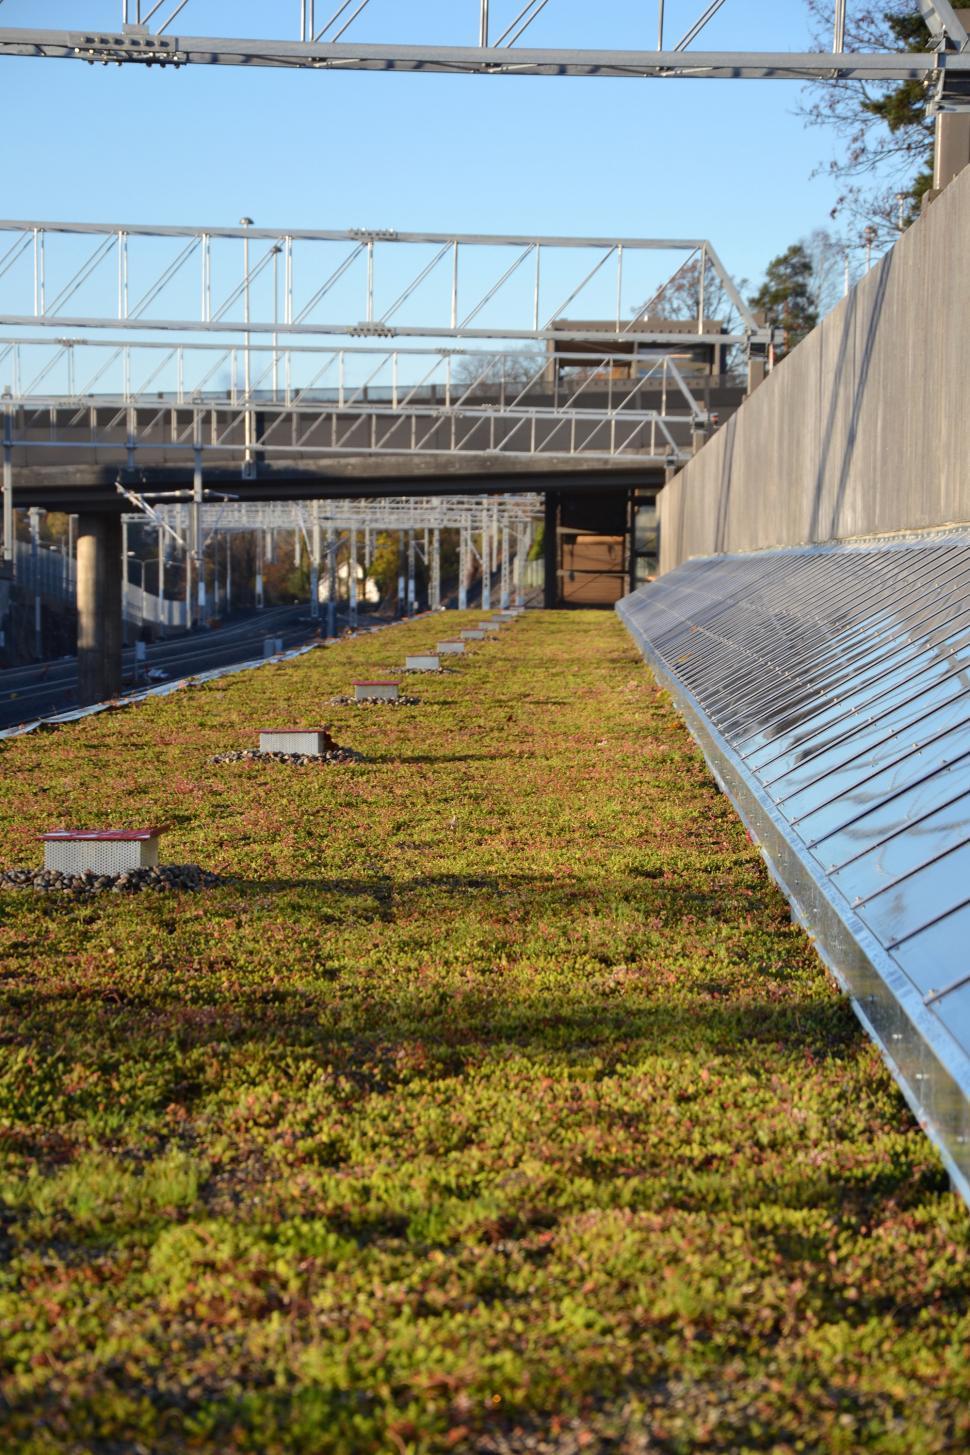 Download Free Stock HD Photo of Sedum green roof Online